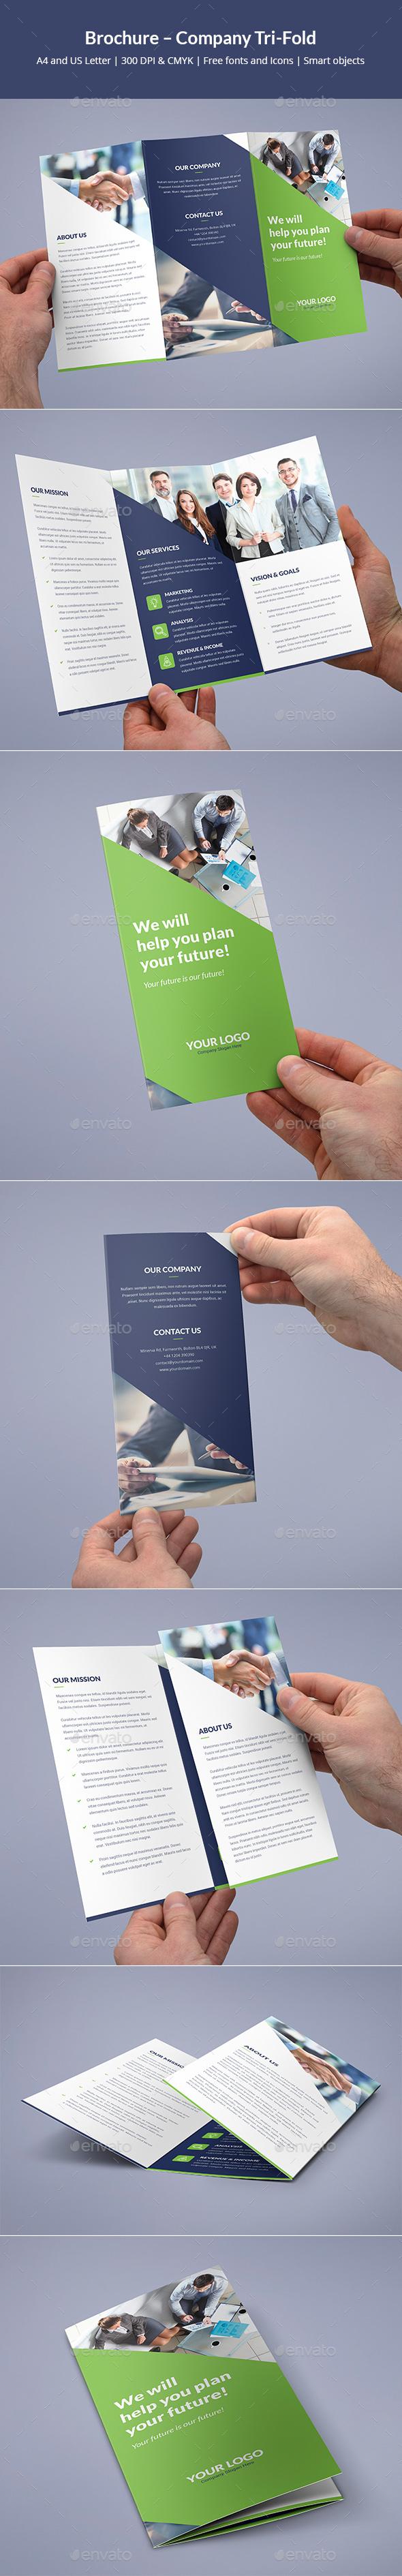 Brochure – Company Tri-Fold - Corporate Brochures